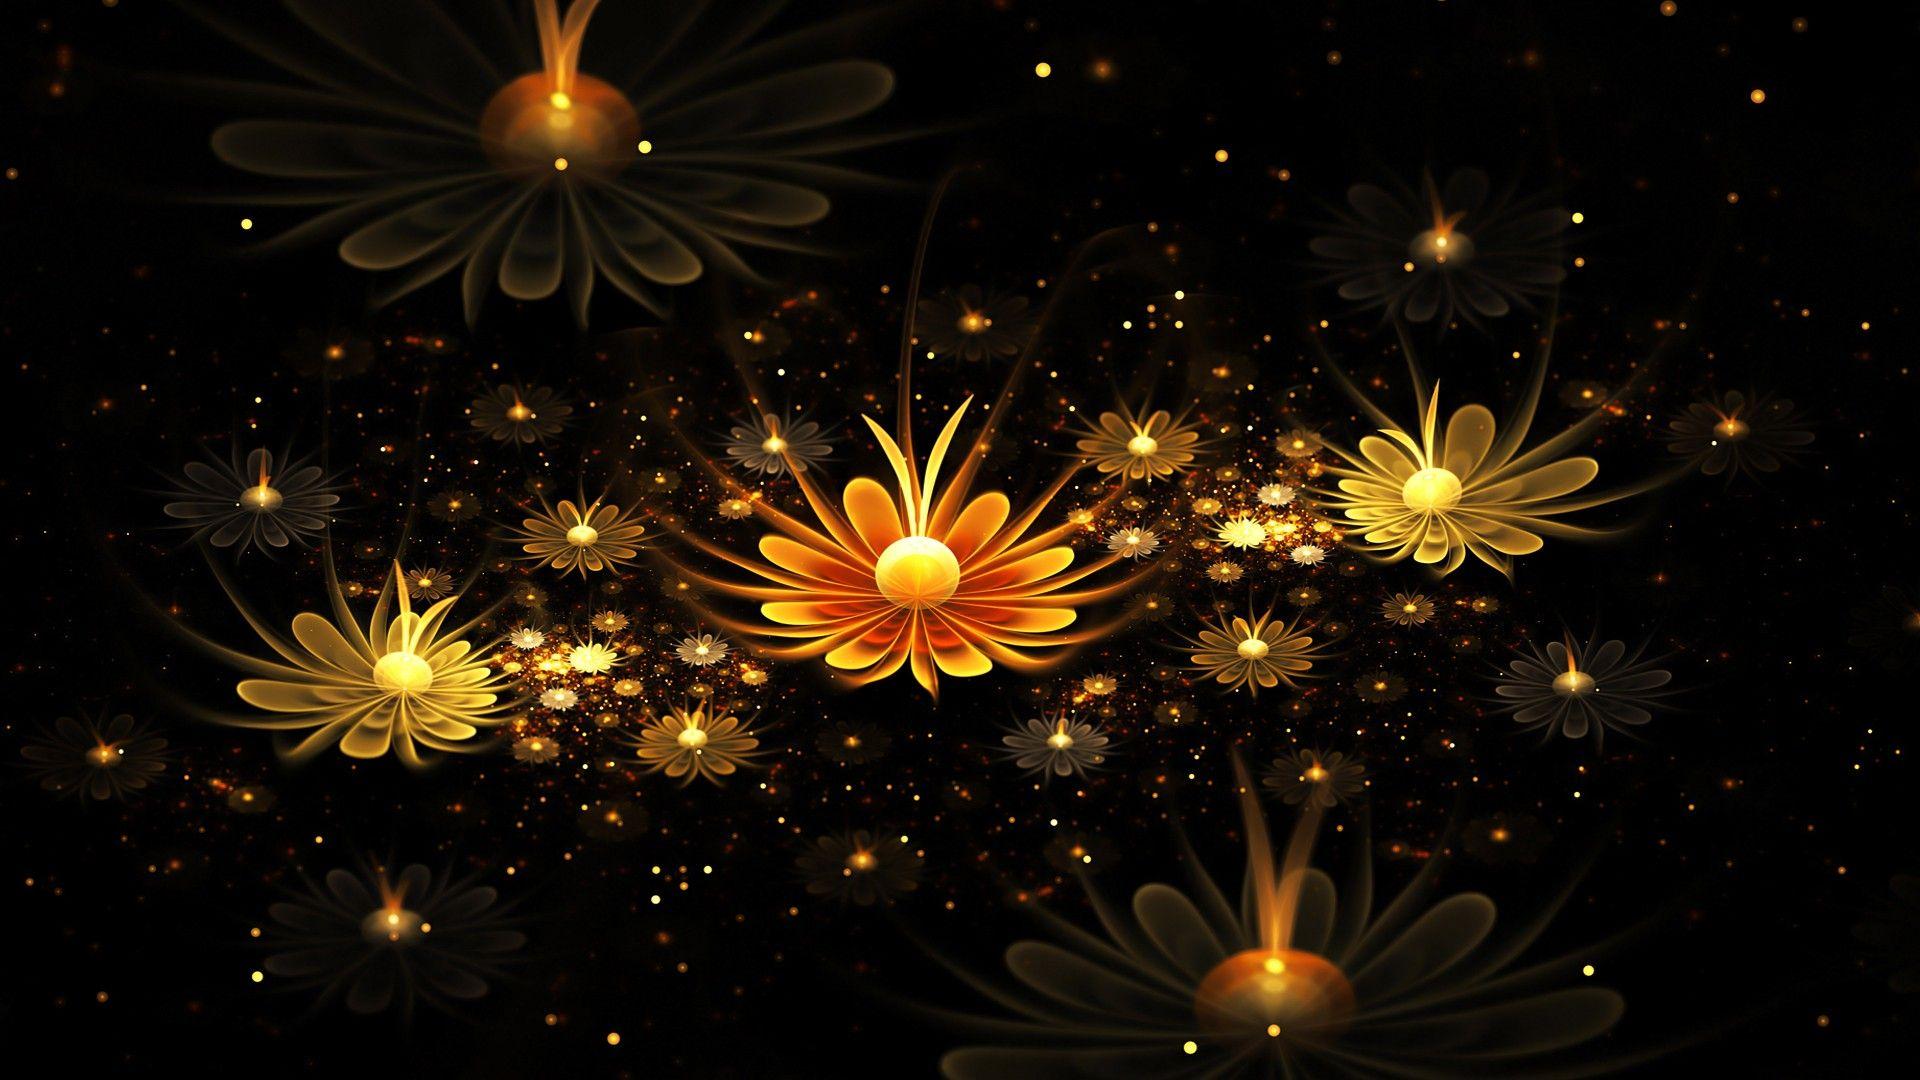 3D Flower Wallpaper HD Flower wallpaper, Full hd desktop